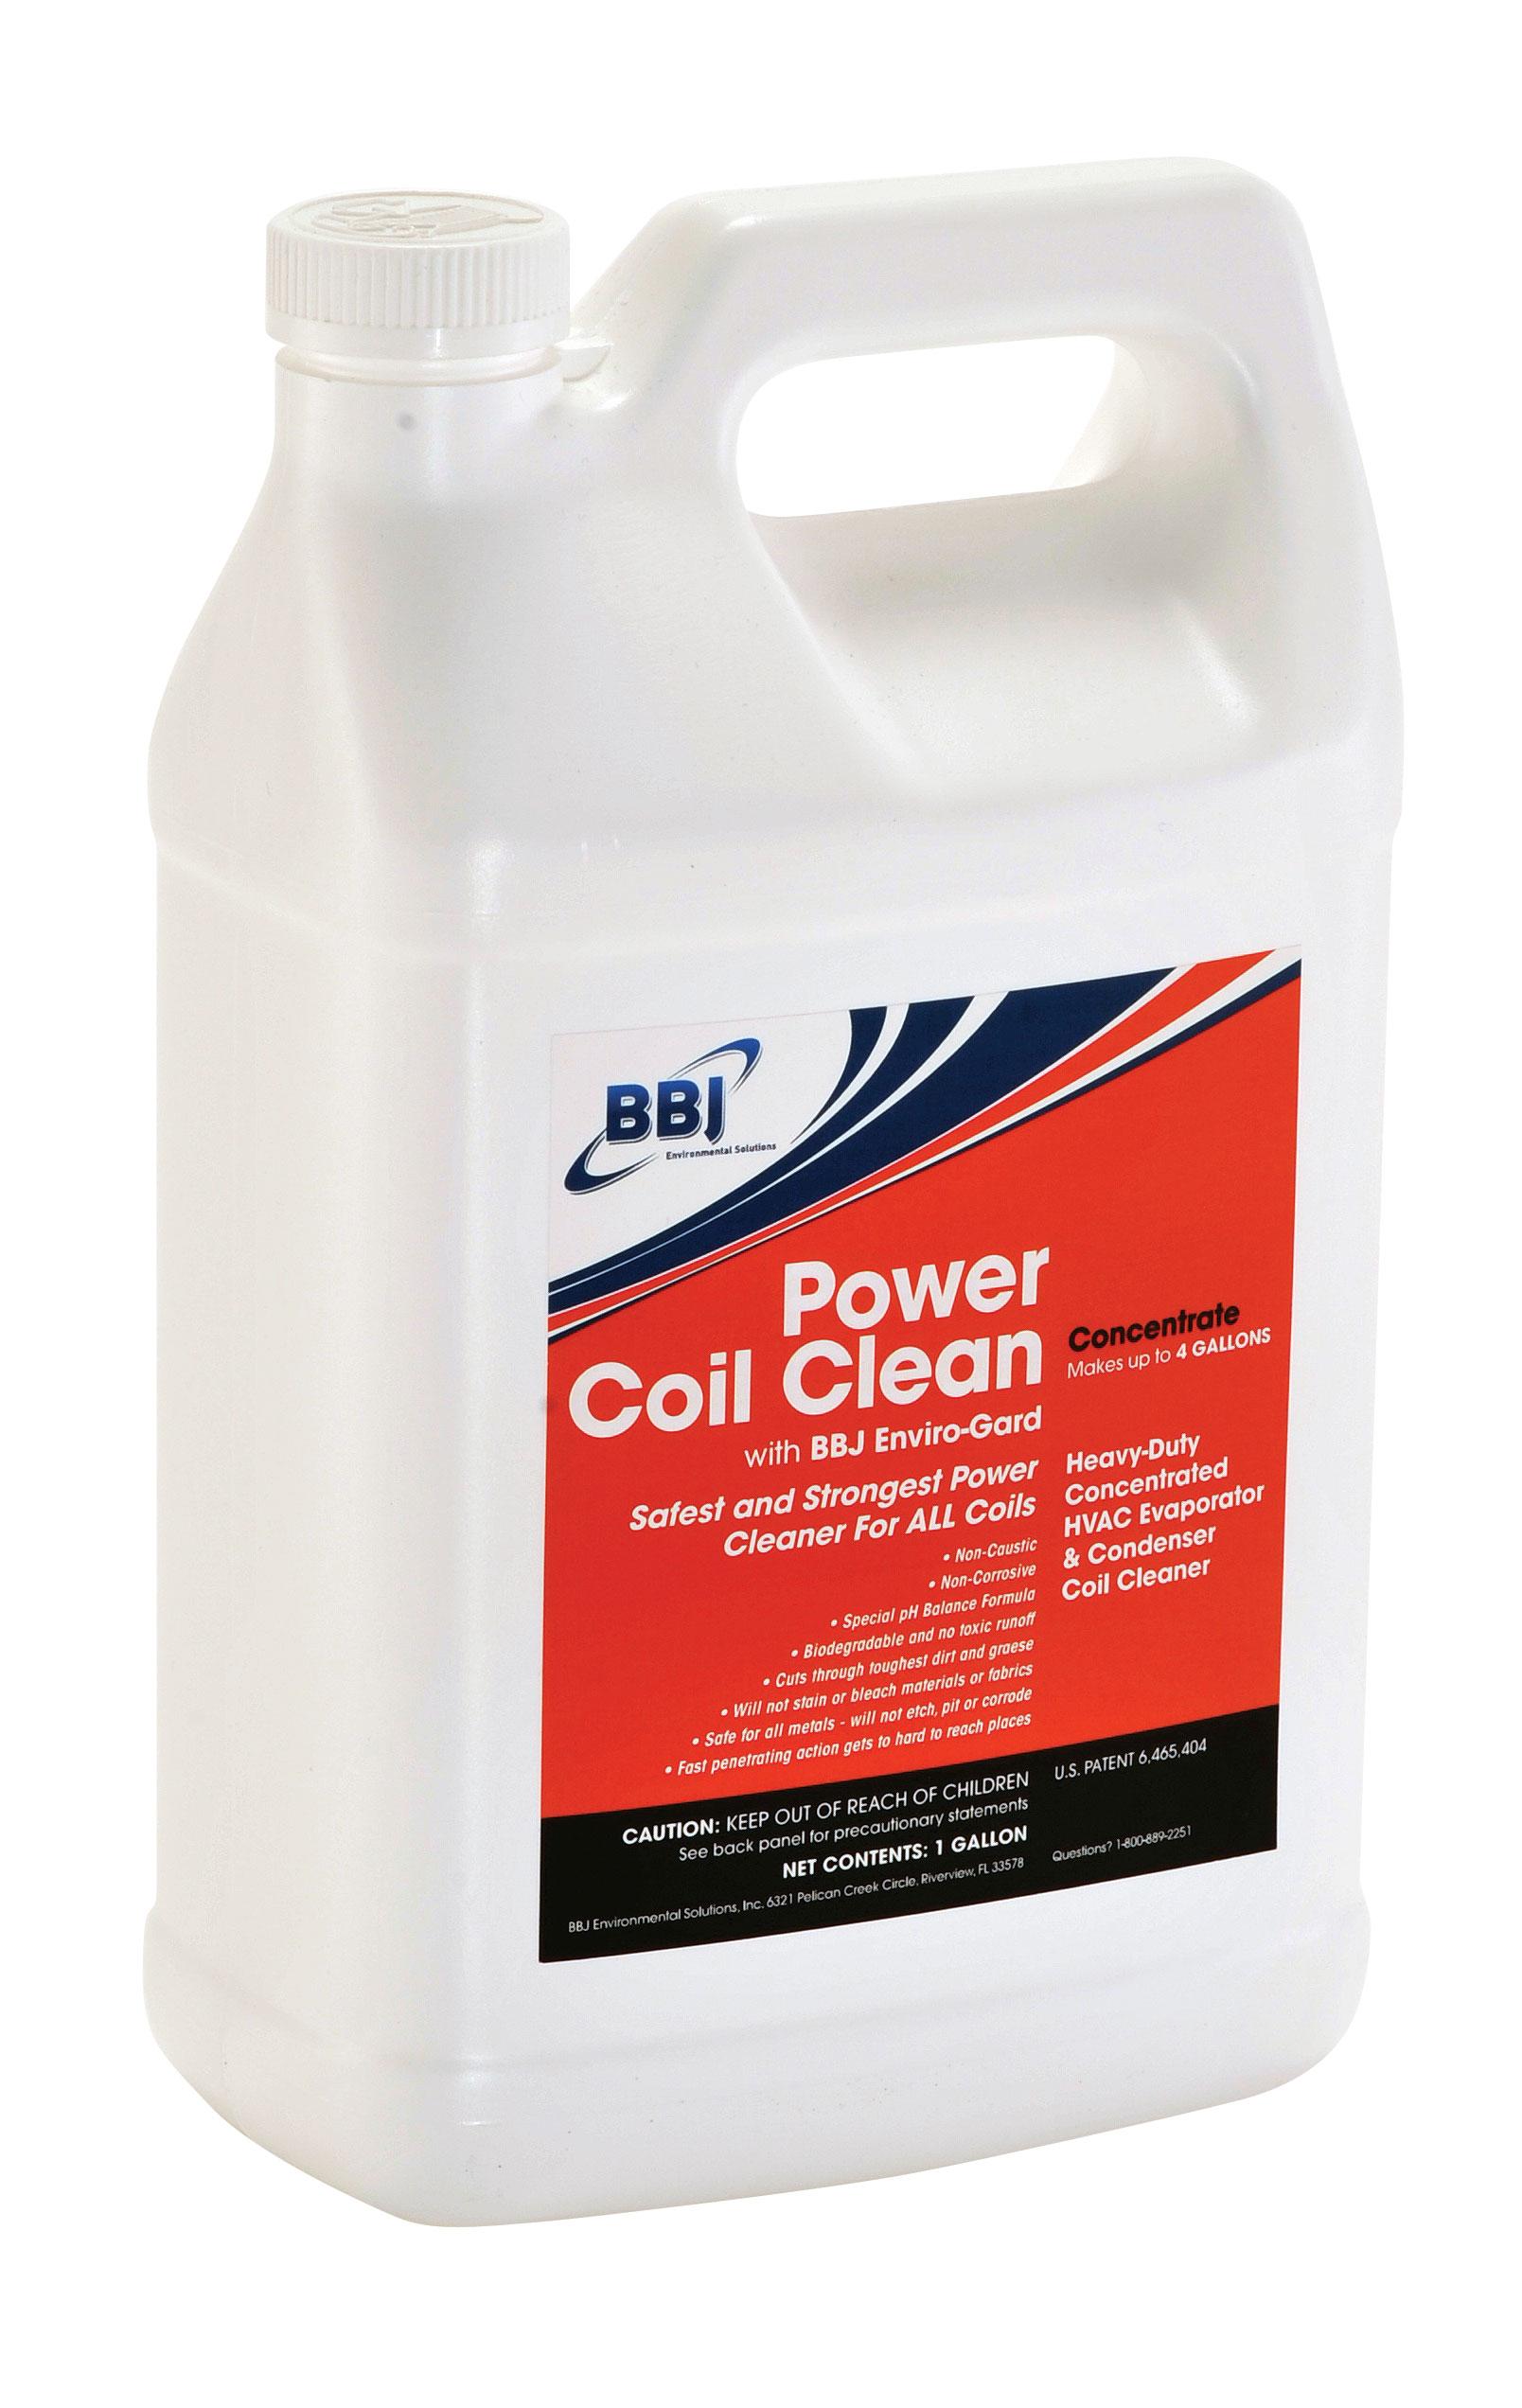 bbj power coil clean